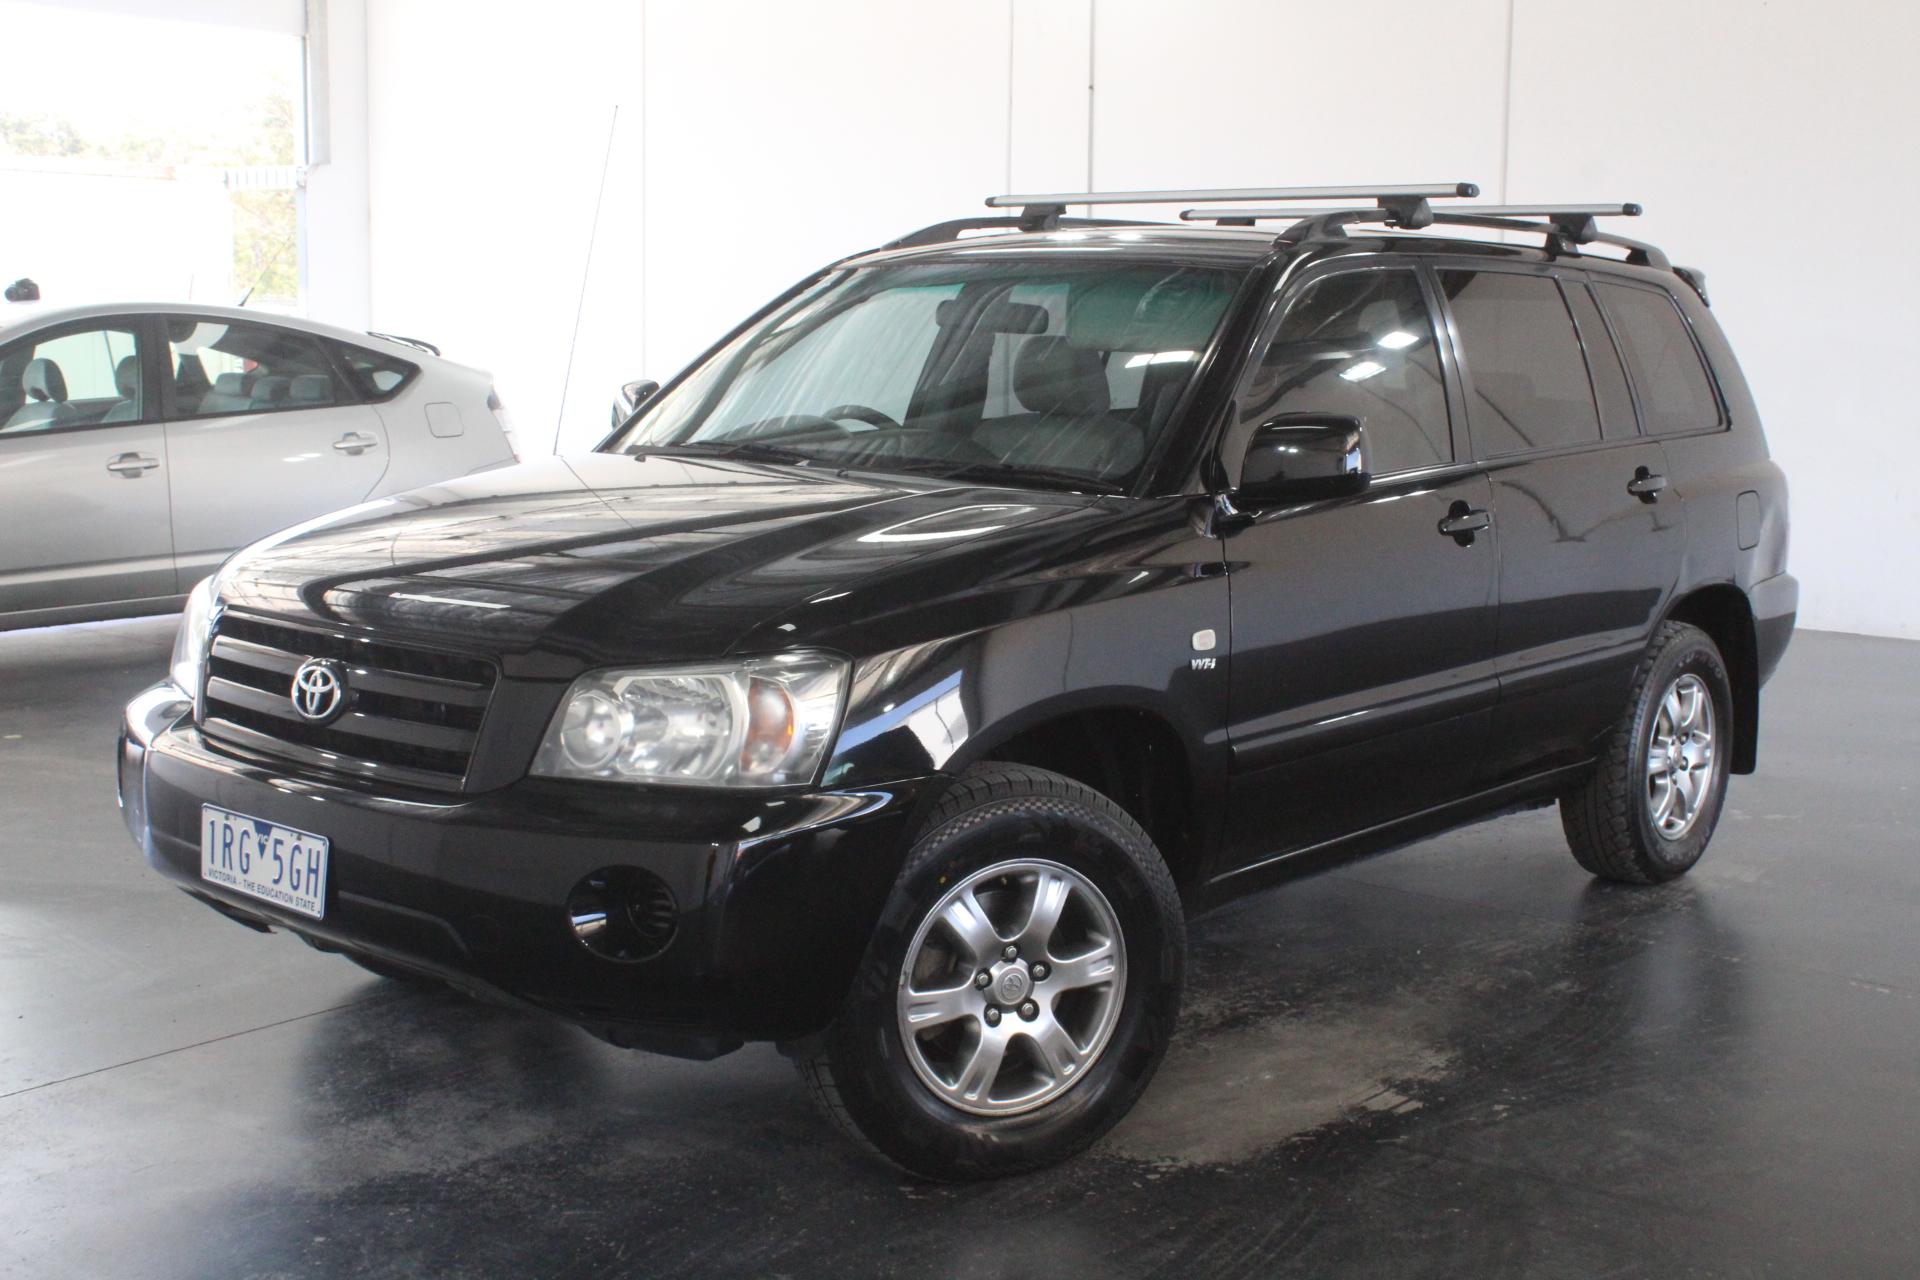 2006 Toyota Kluger CVX (4x4) Auto 7 Seats Wagon, RWC Issued 28/01/2020